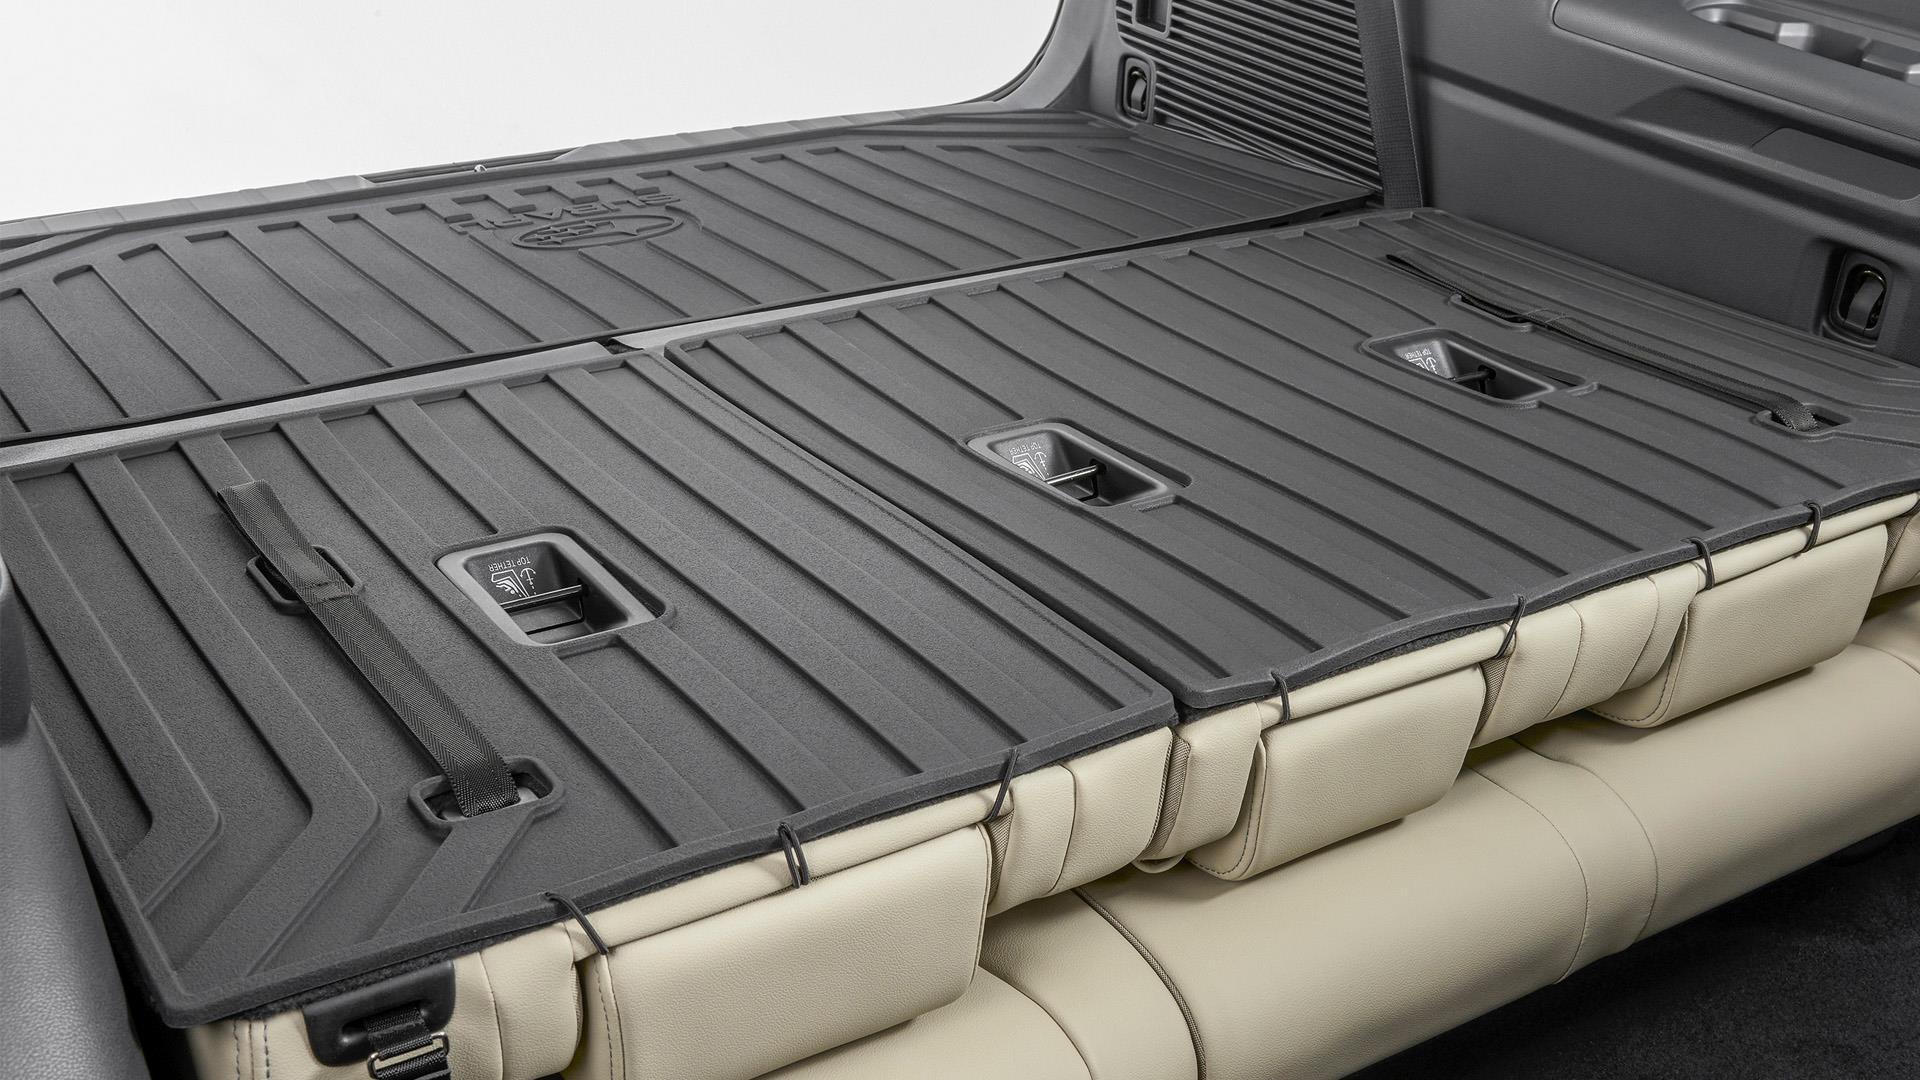 Rear Seat Back Protector / Ascent - Subaru (J501SXC110)